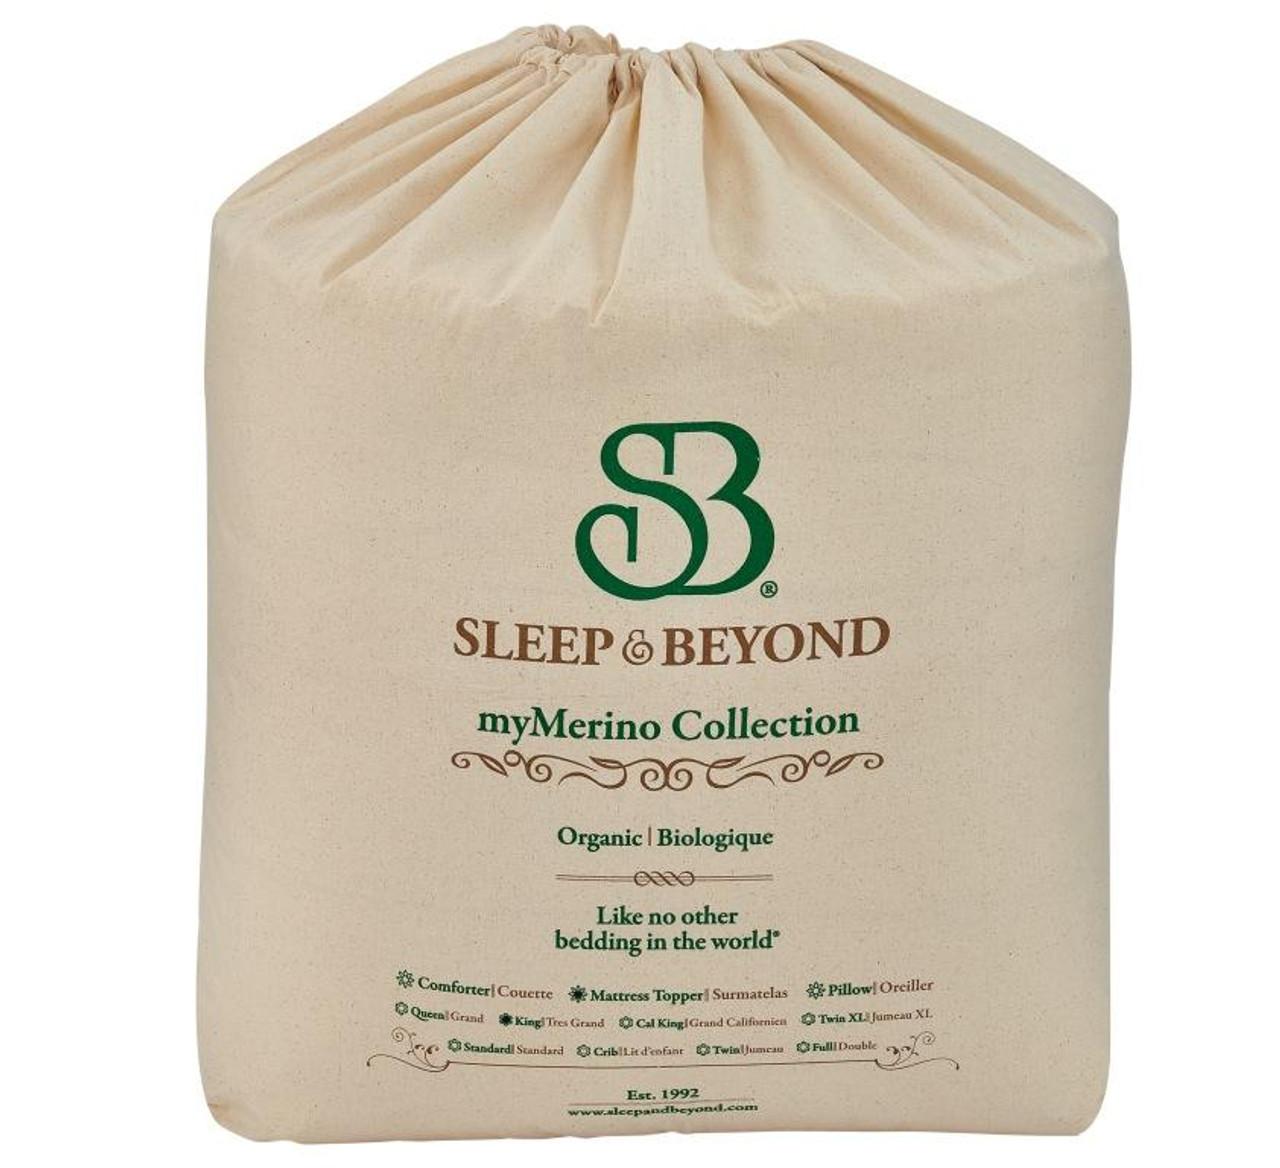 Sleep & Beyond myMerino™ Comforter, Organic Merino Wool Comforter Outer Packaging